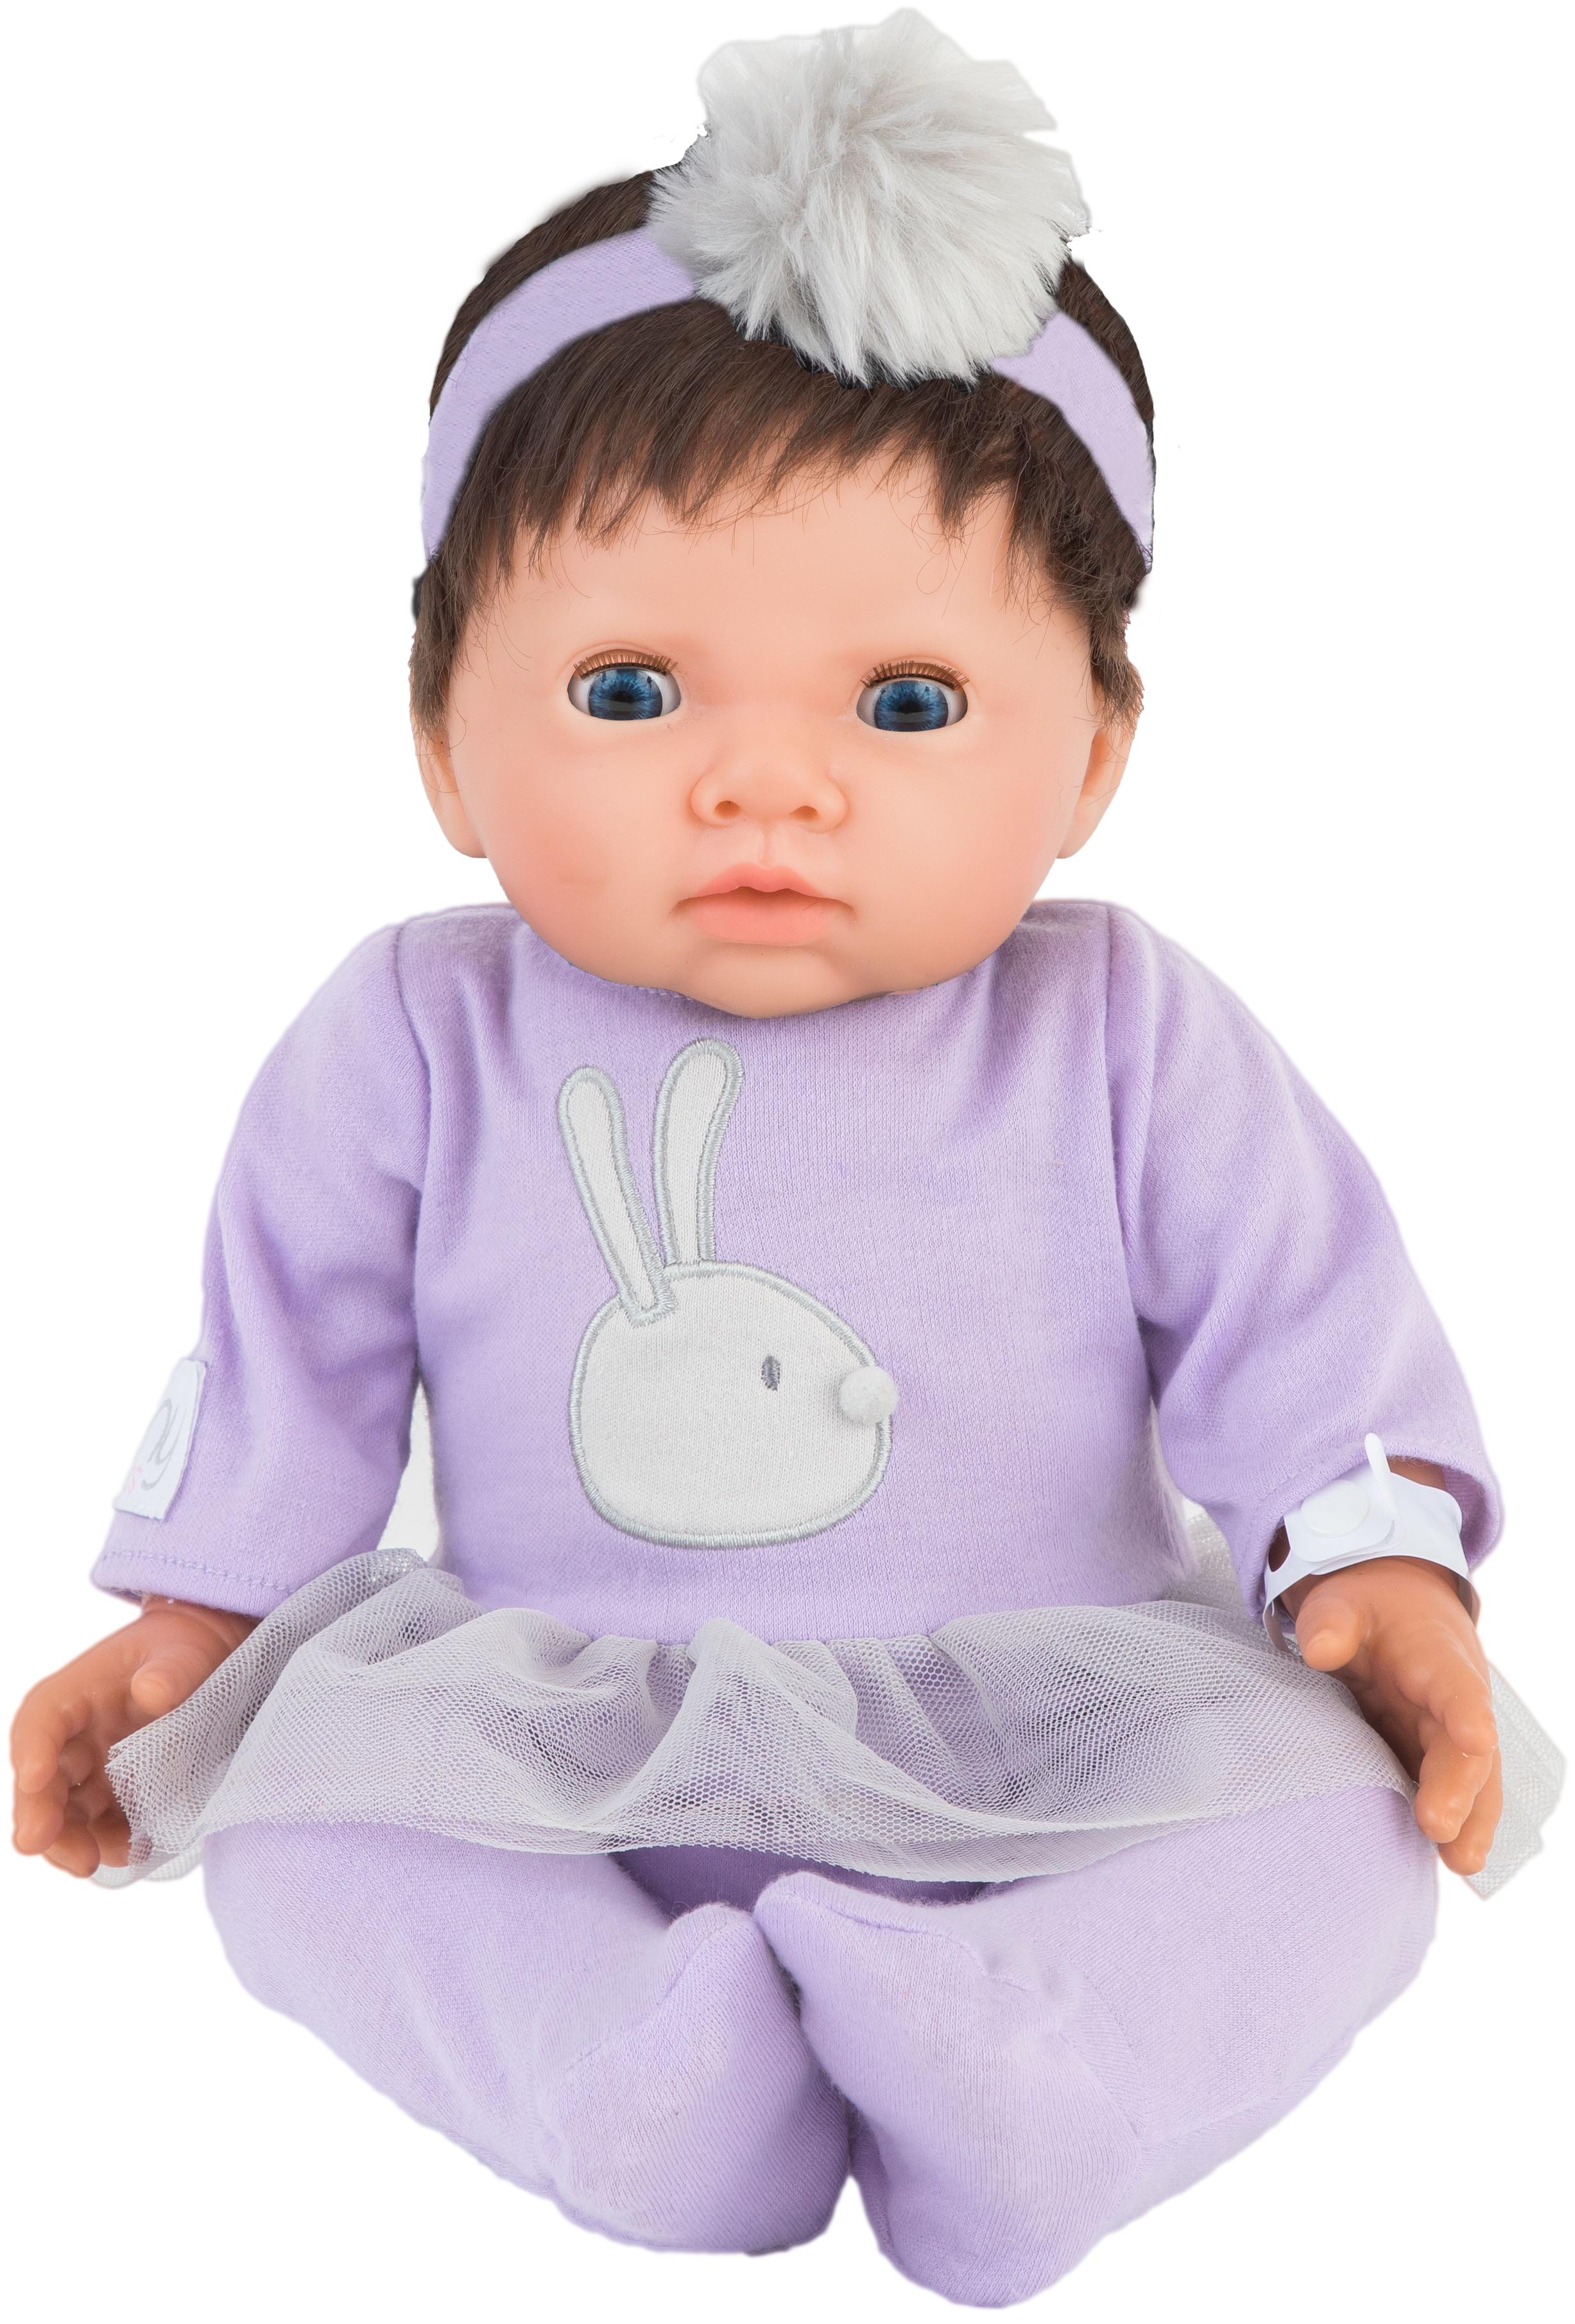 Tiny Treasure - Doll w/ Brown Hair & Purple Tutu Dress (30140)